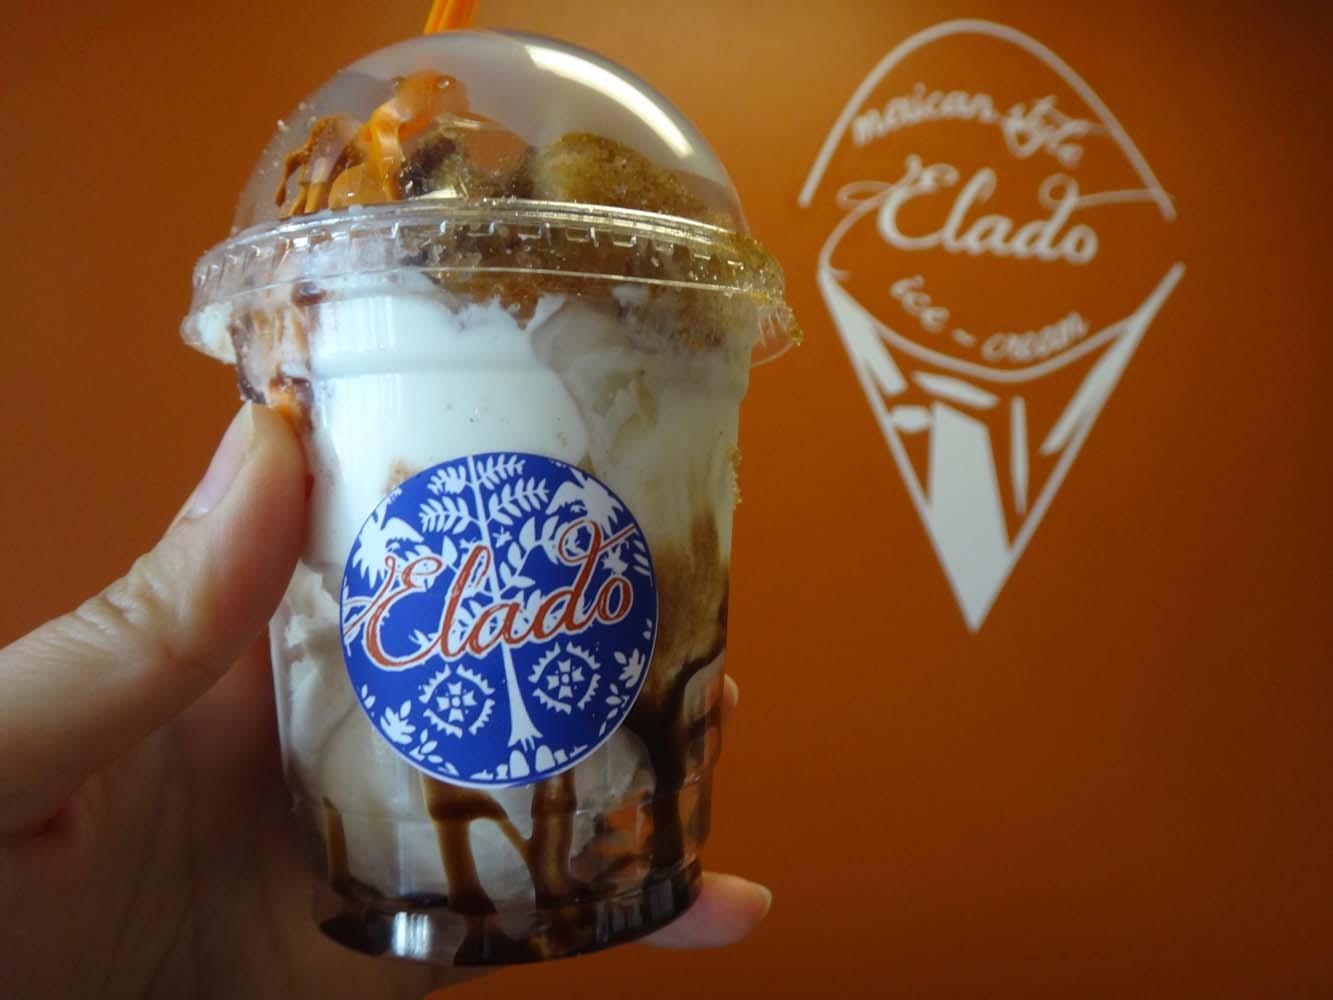 YUMMY FRESH CHURROS WITH MEXICAN STYLE ICE CREAM @ ELADO - ANAHEIM ...